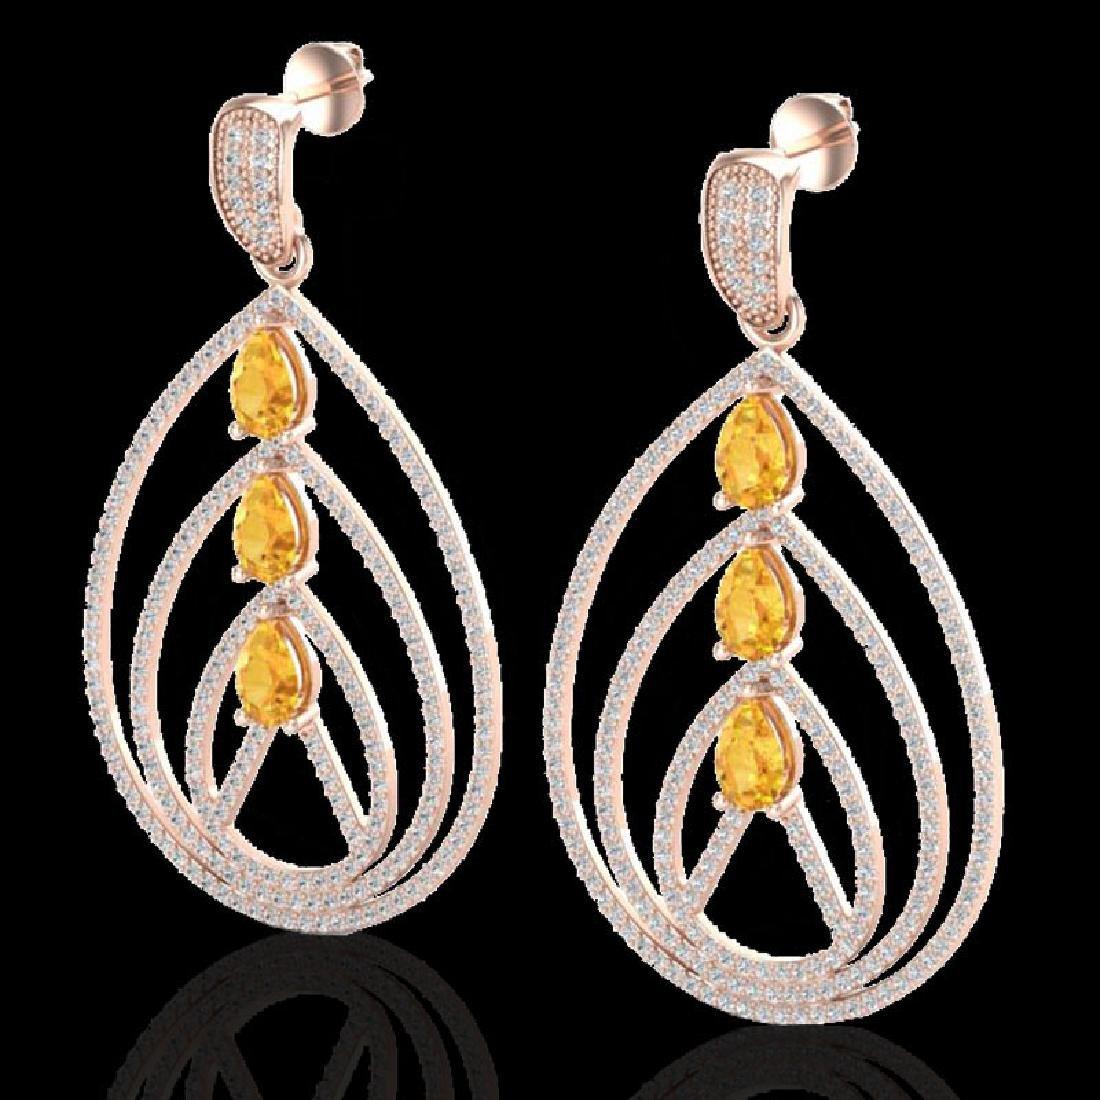 4 CTW Citrine & Micro Pave VS/SI Diamond Earrings 14K